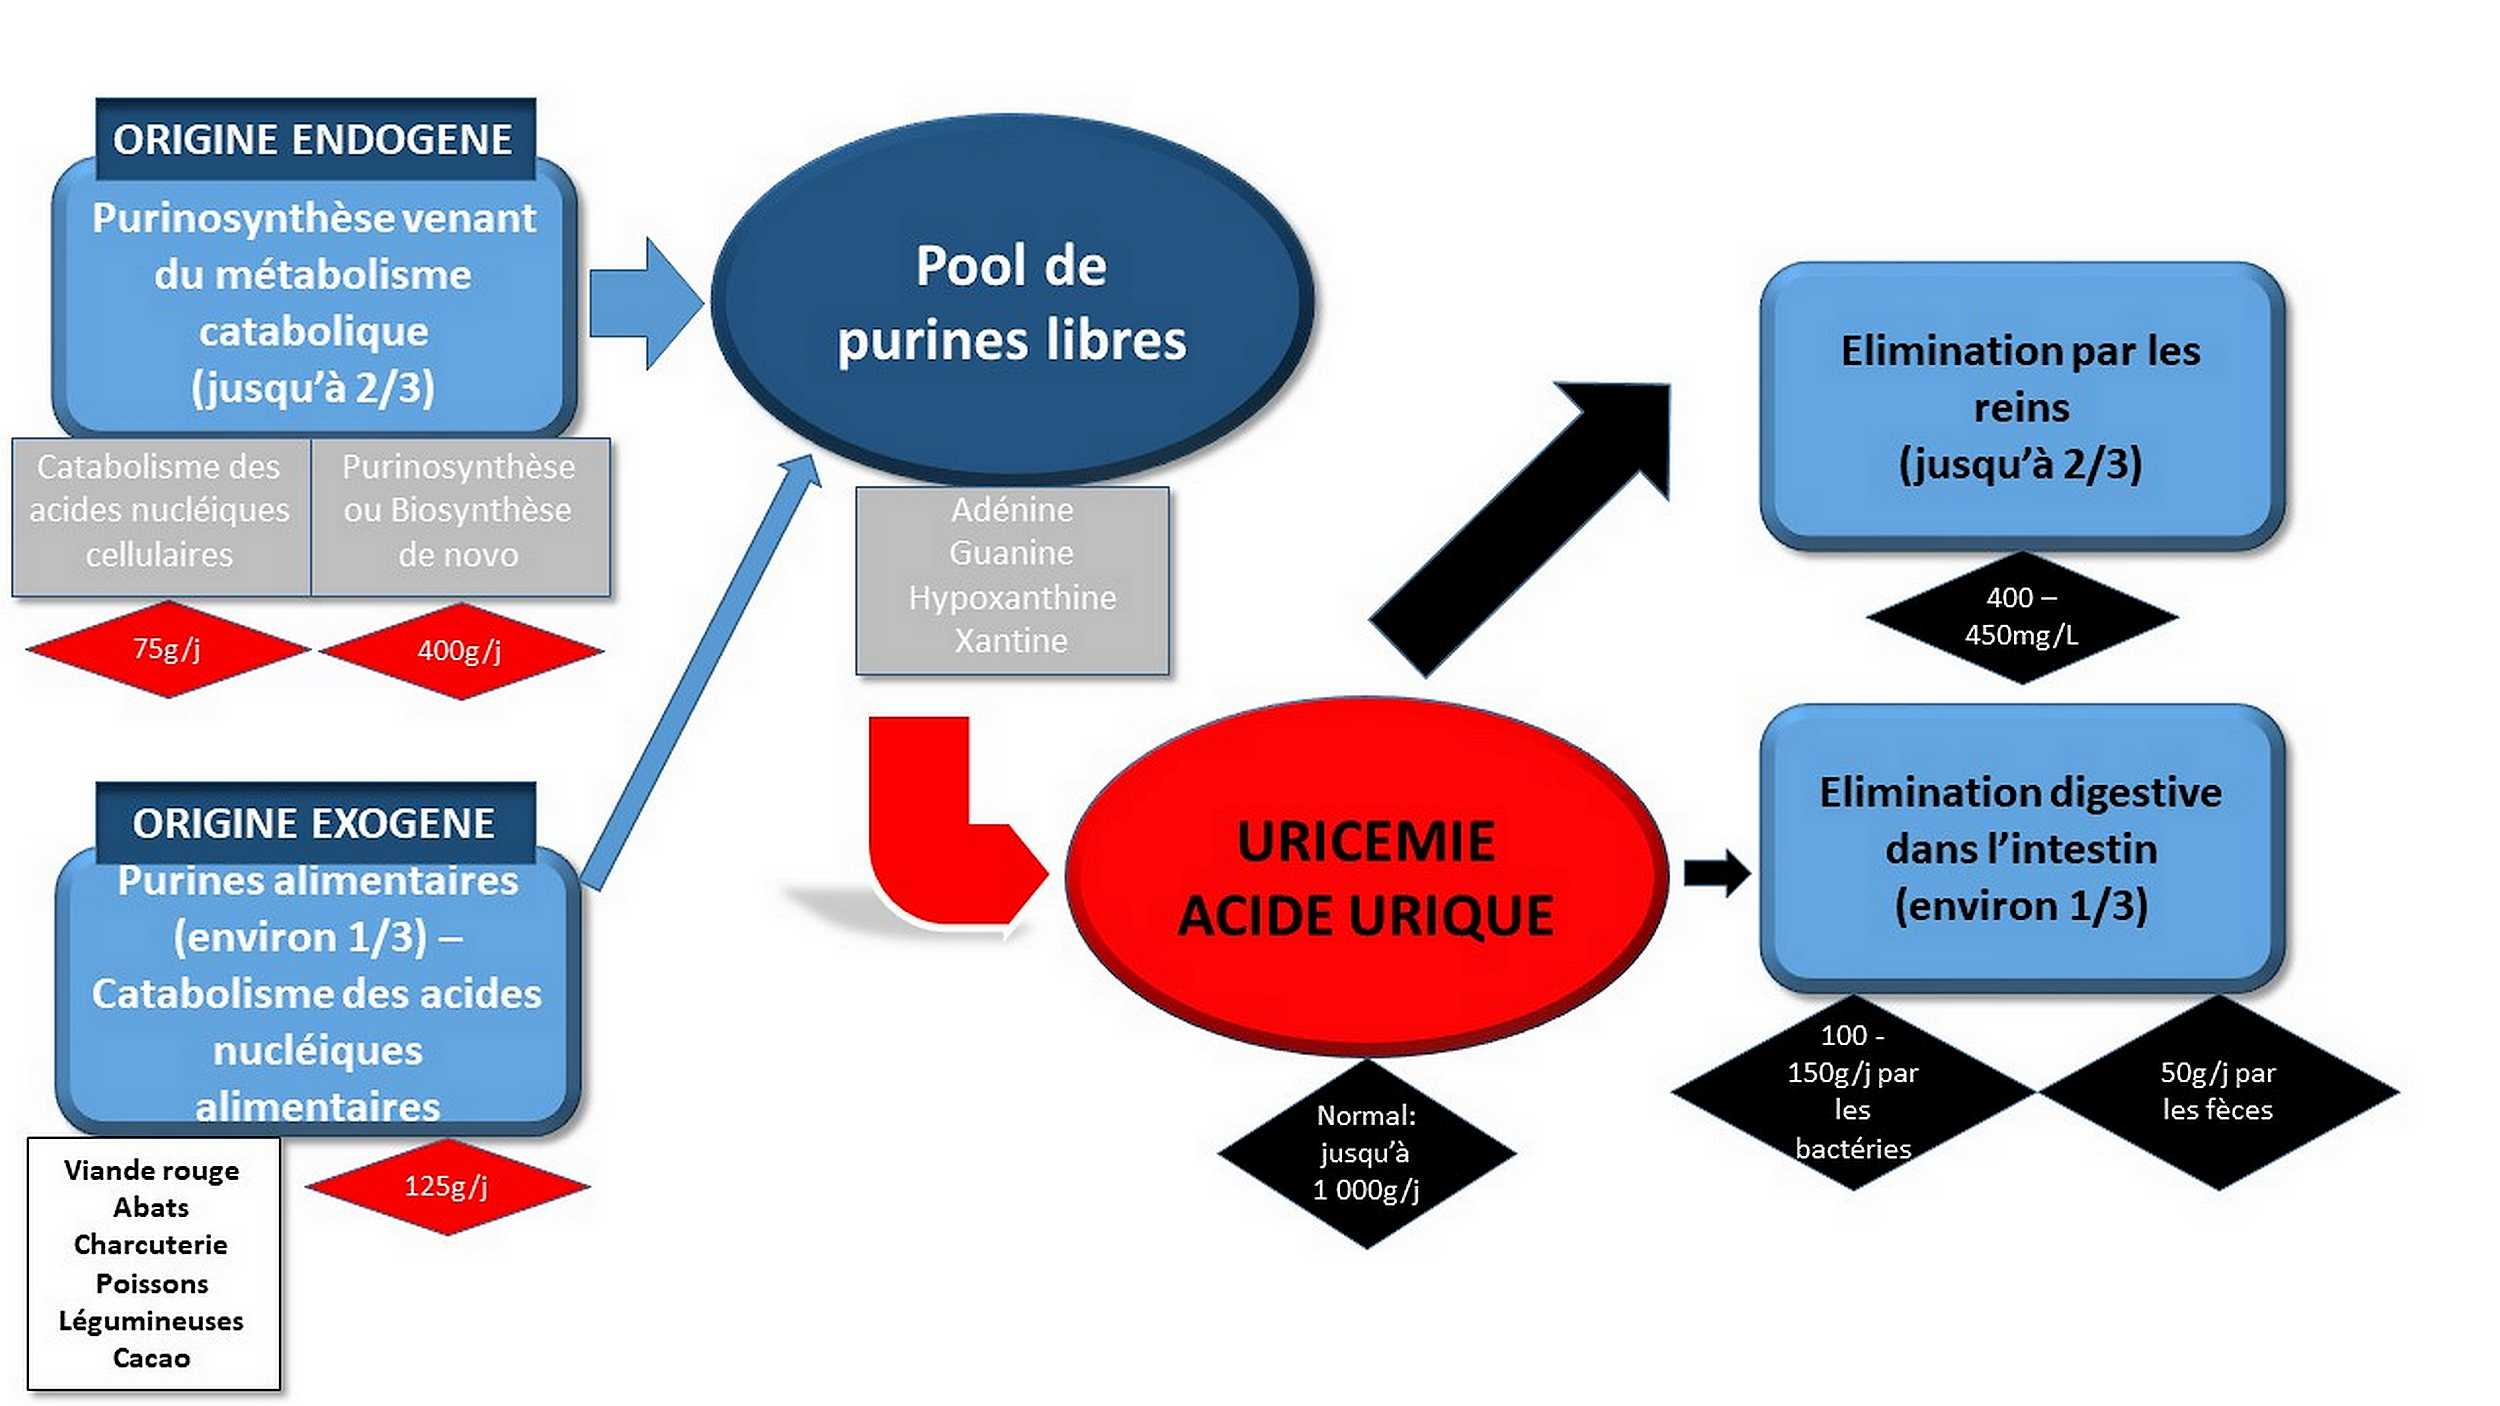 Elimination Acide urique (NHA)